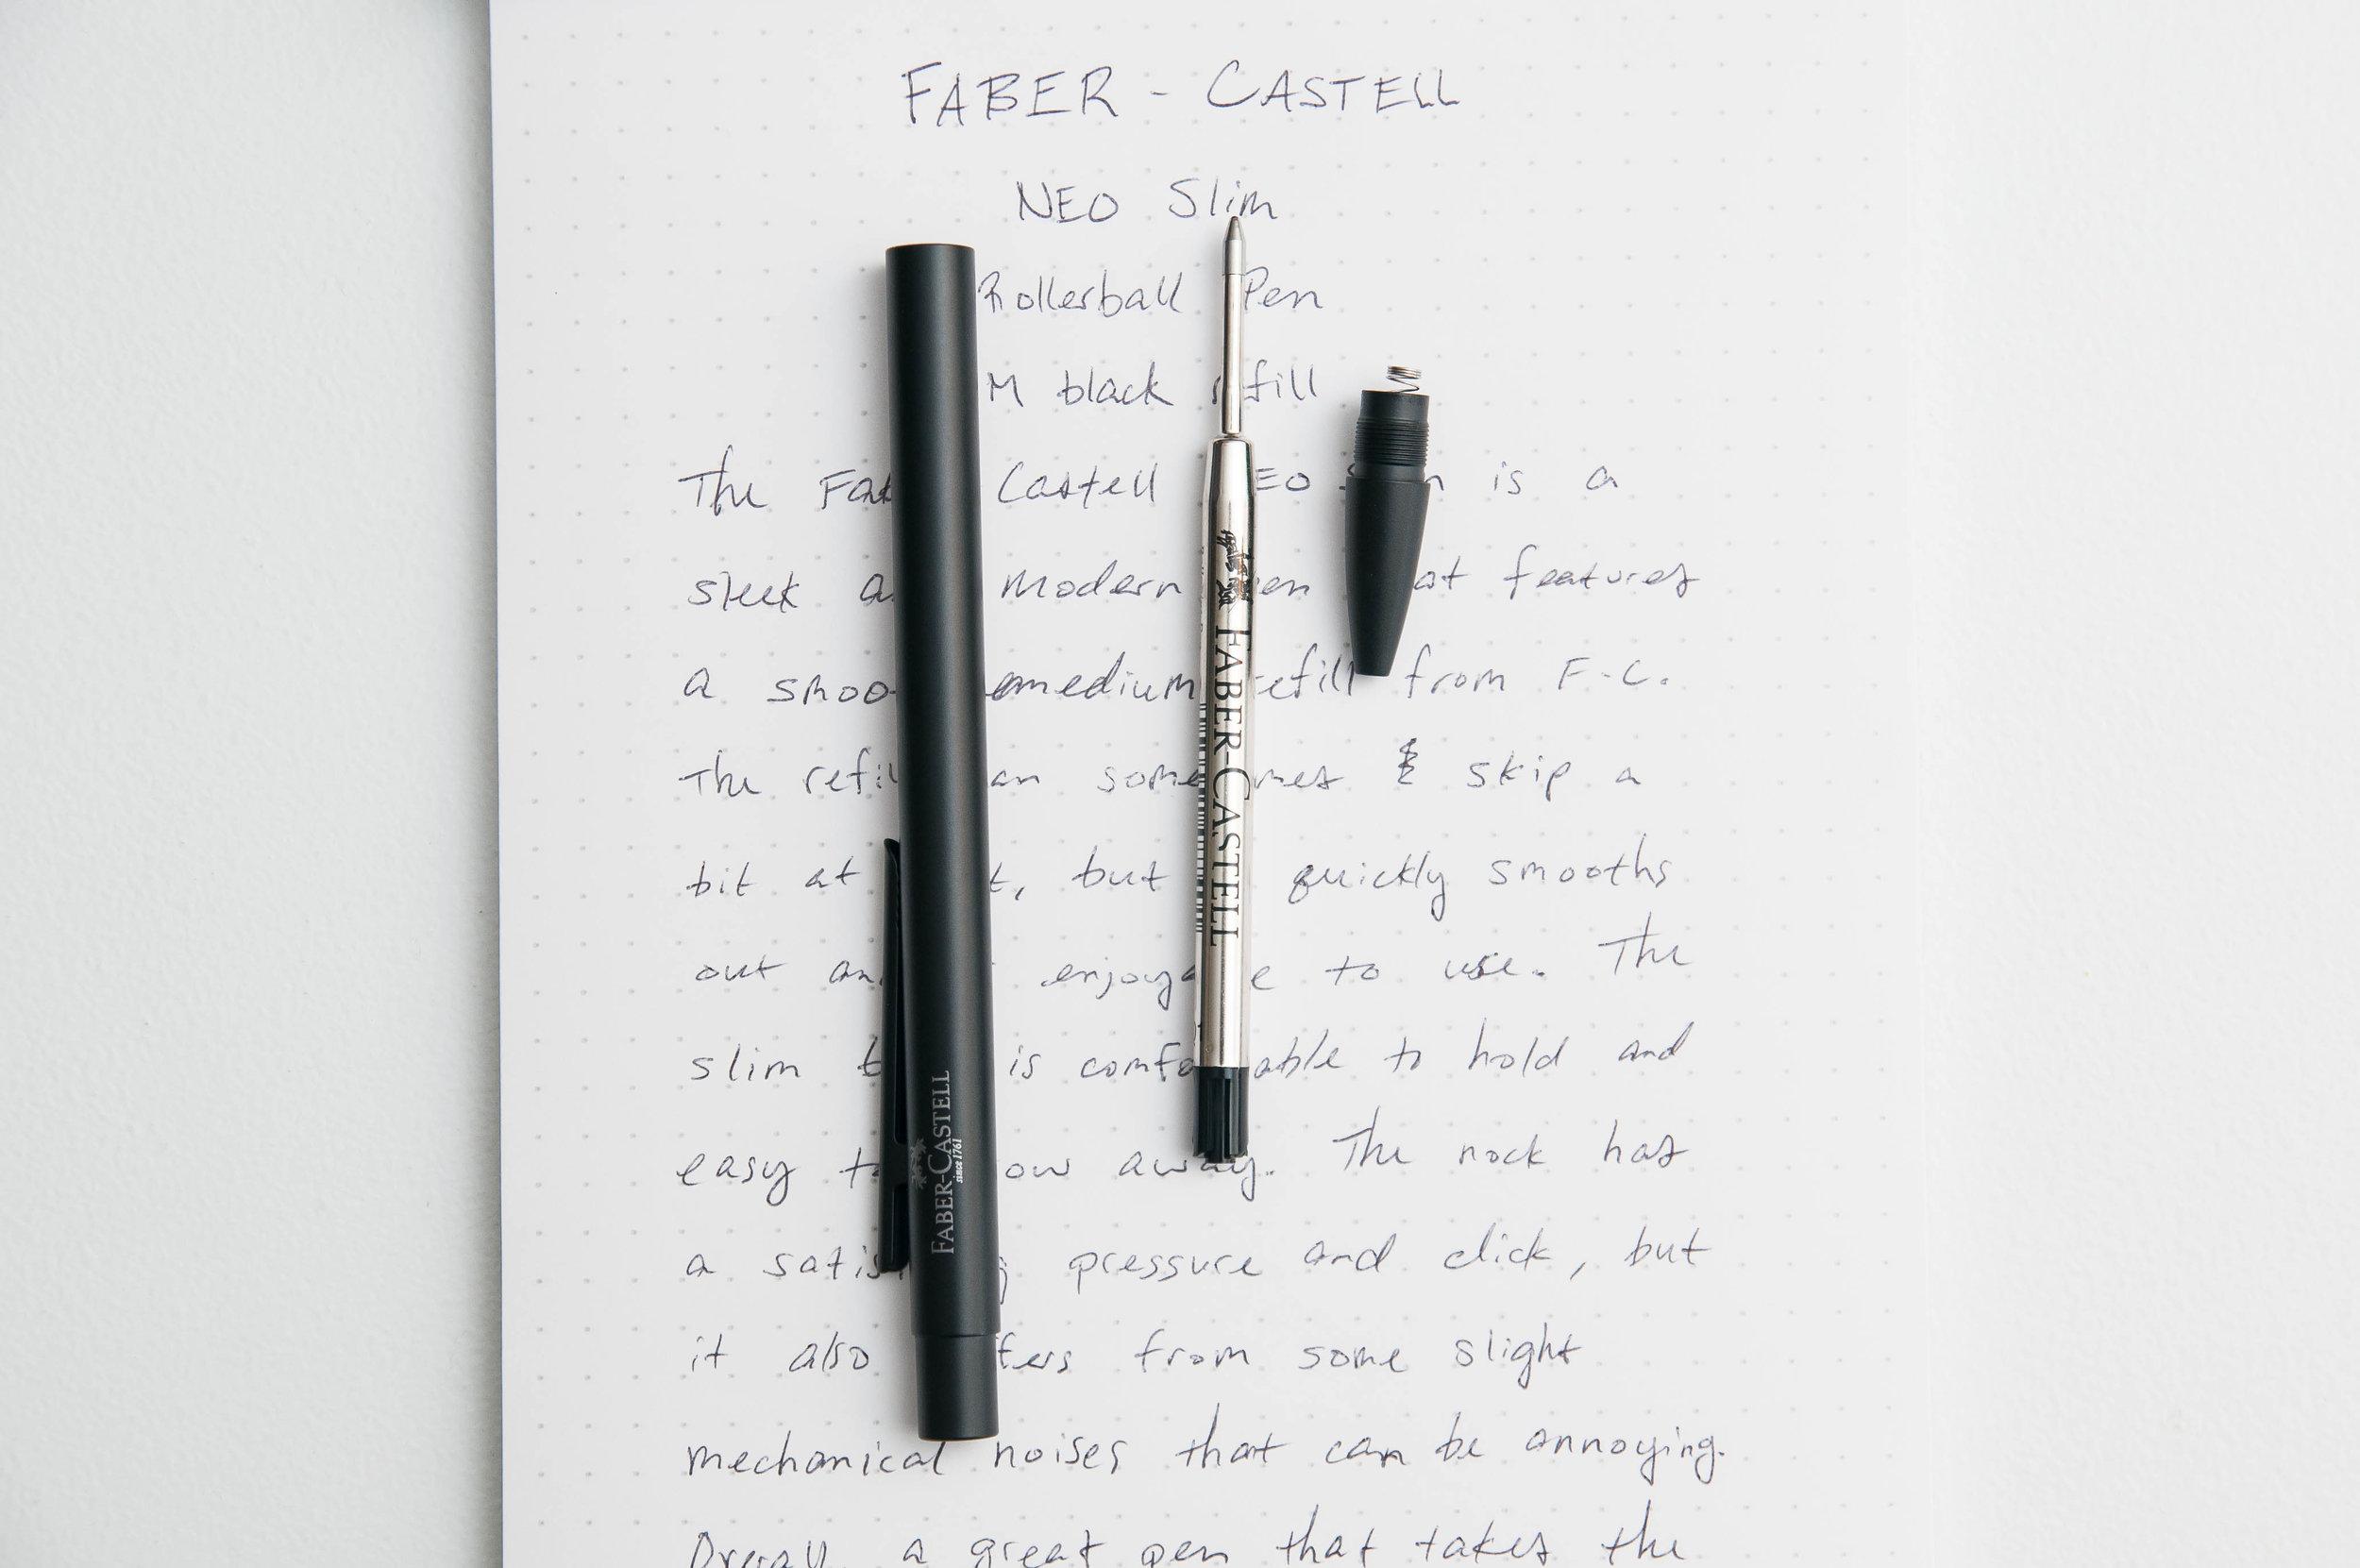 Faber-Castell NEO Slim Rollerball Pen